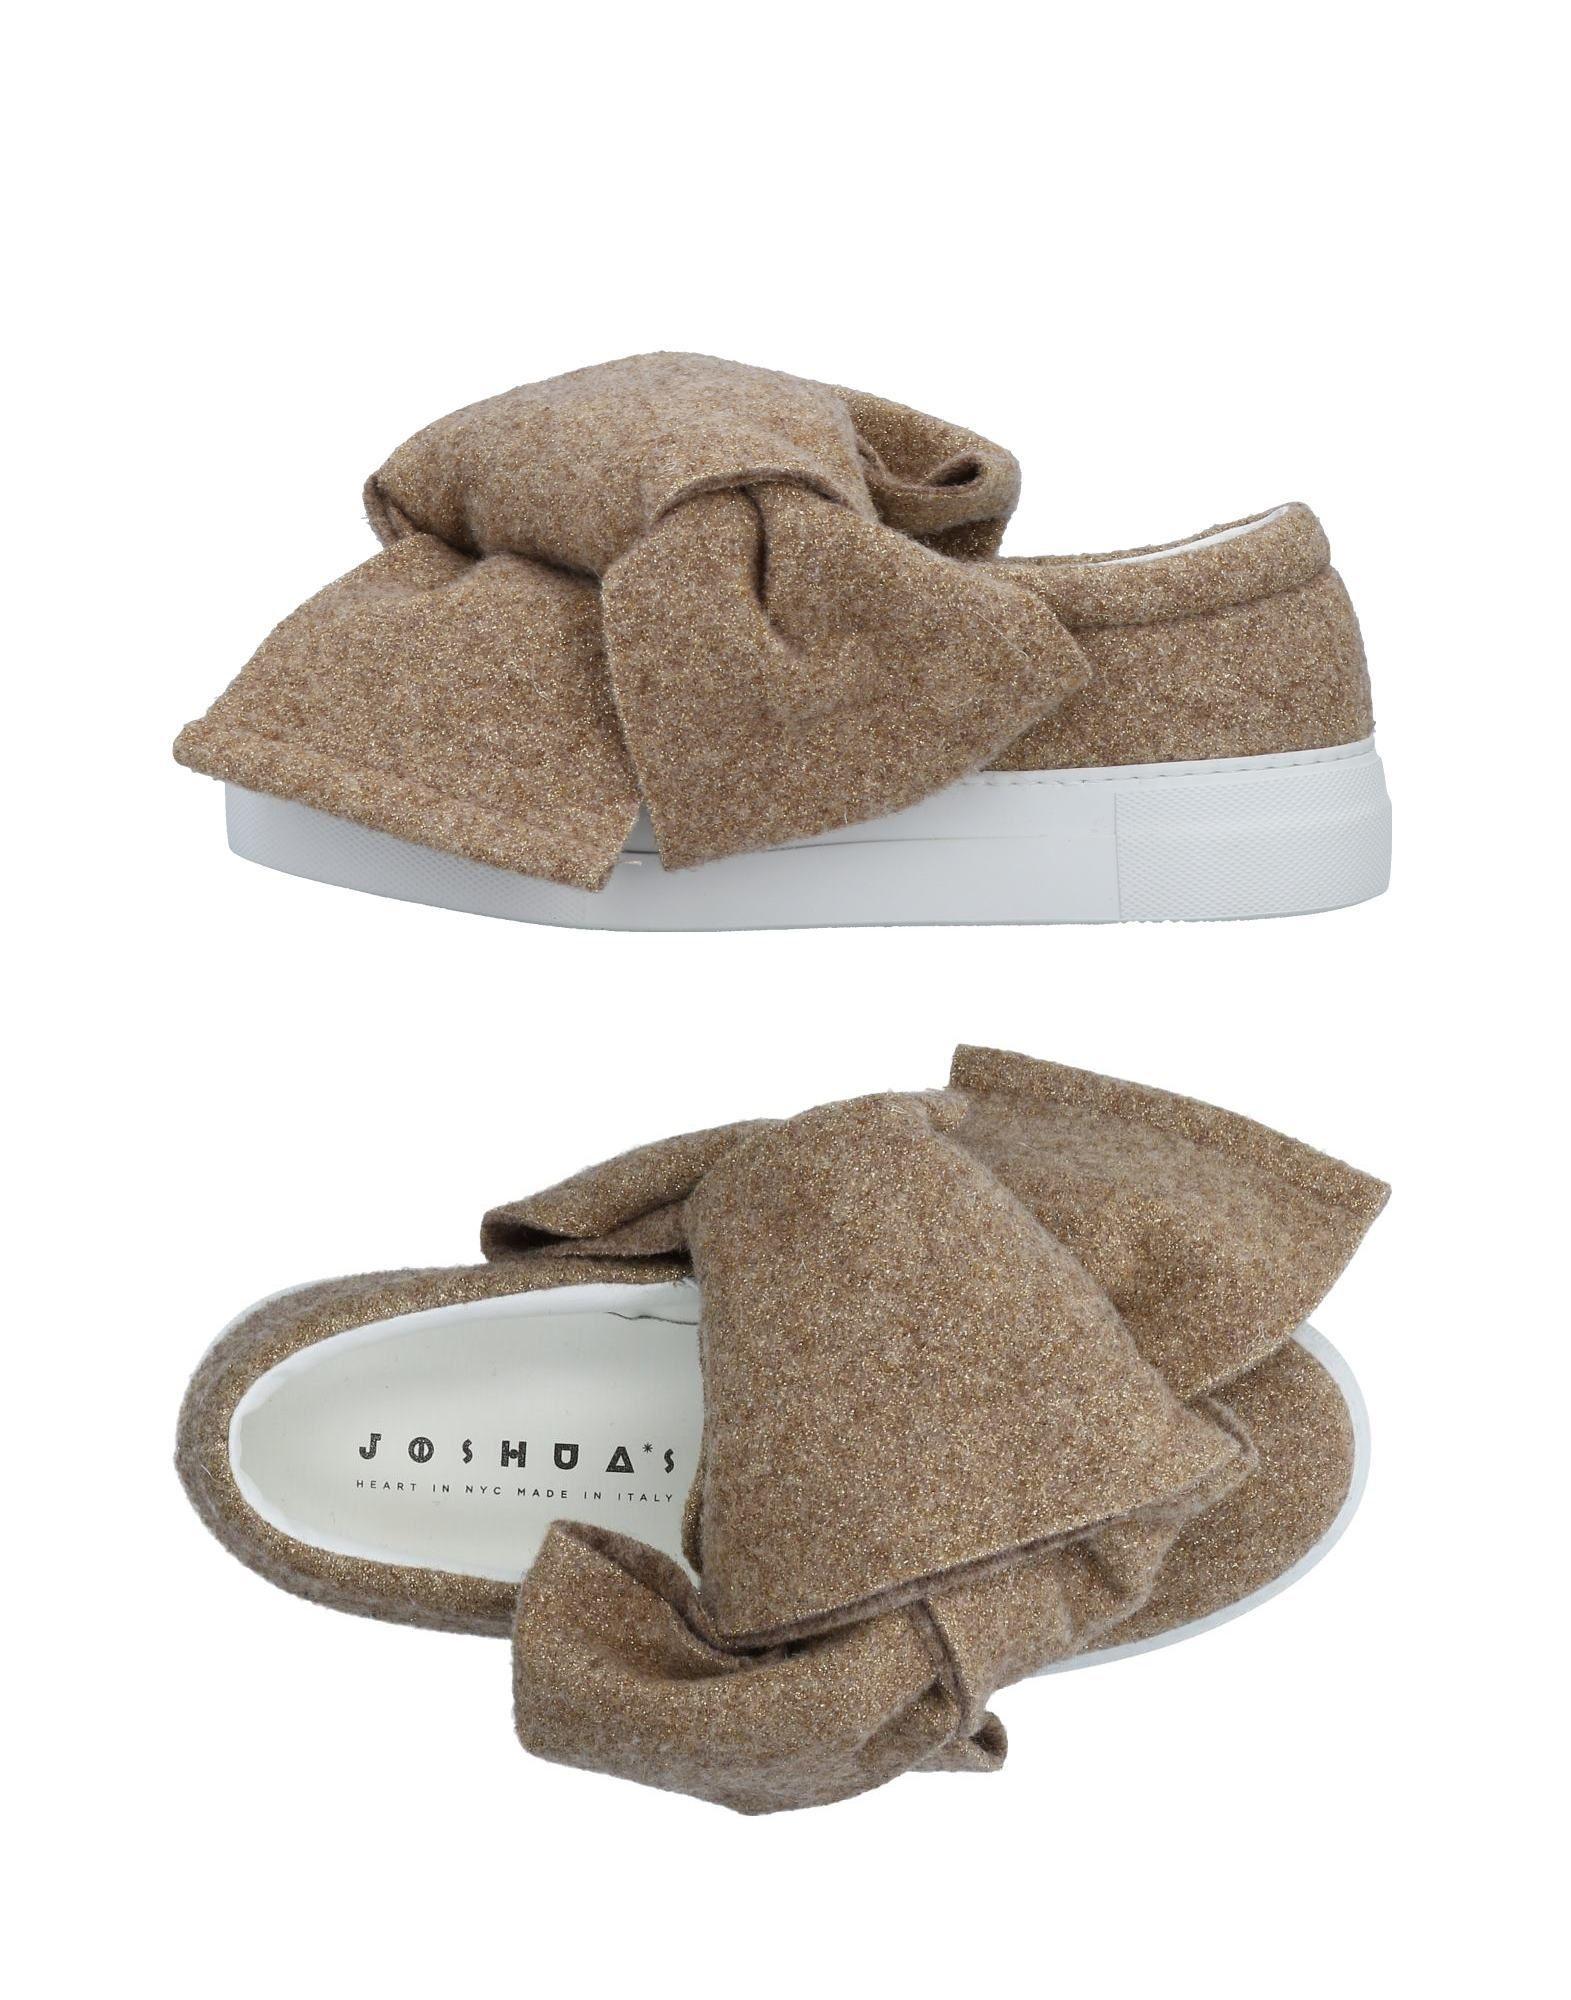 Moda Sneakers Joshua*S Donna - 11474607GJ